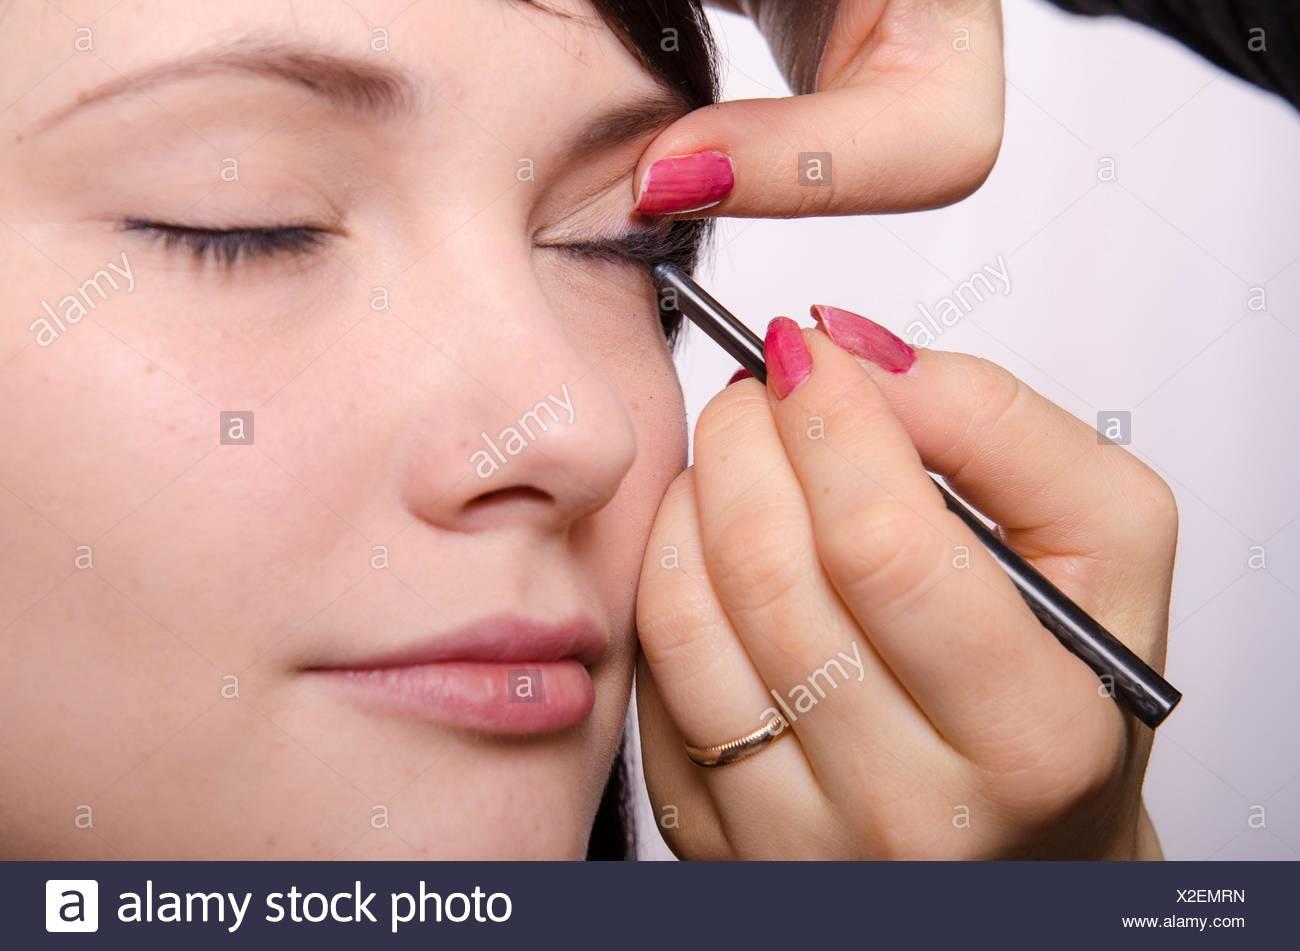 Makeup Artist Deals Makeup On The Models Face She Paints Eyelashes